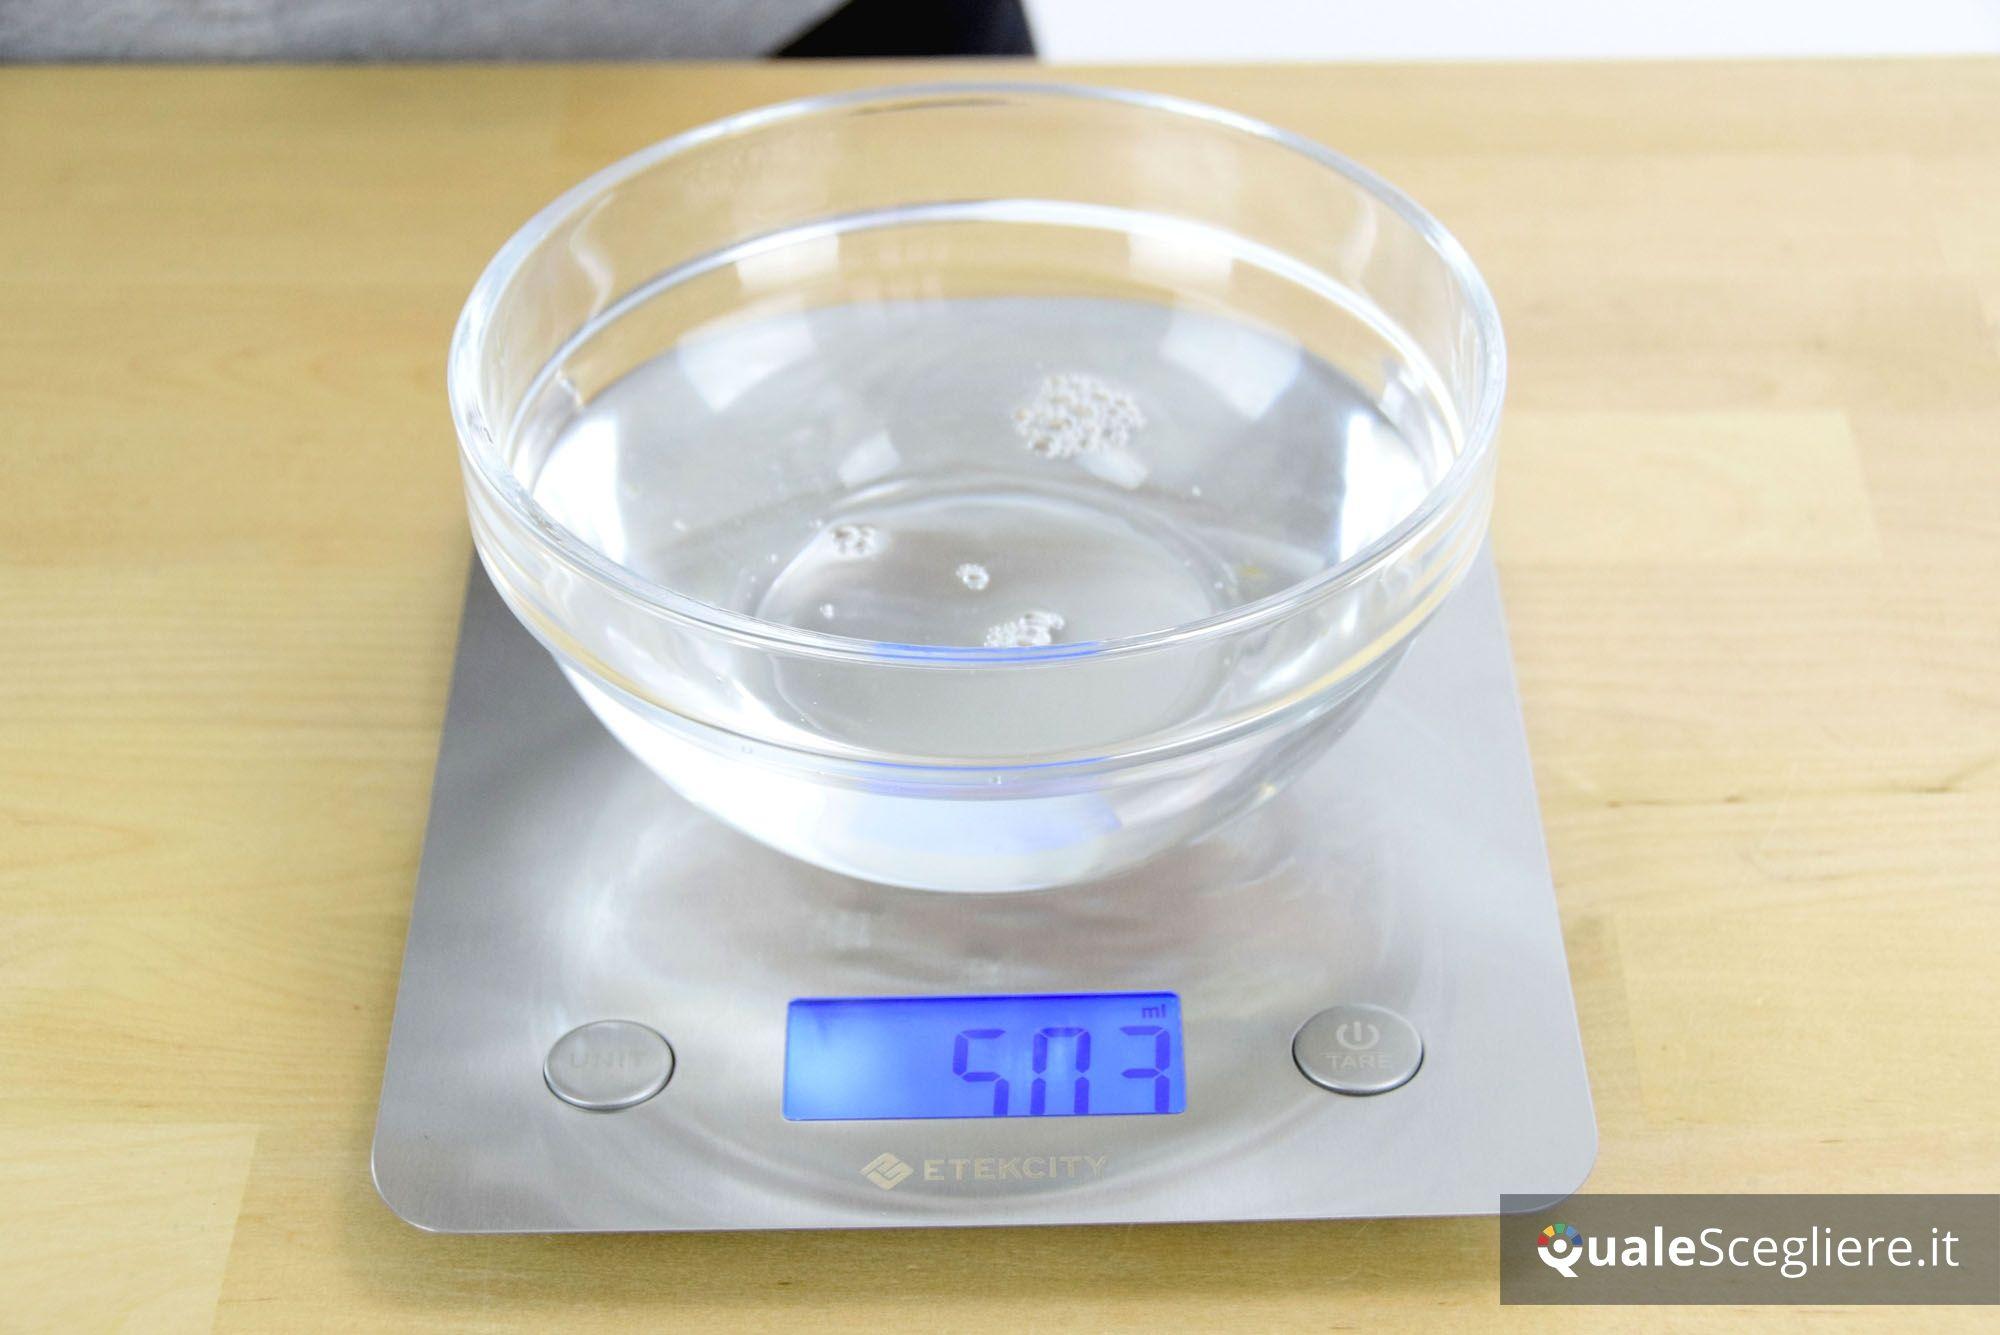 Etekcity EK6211-S peso di liquidi